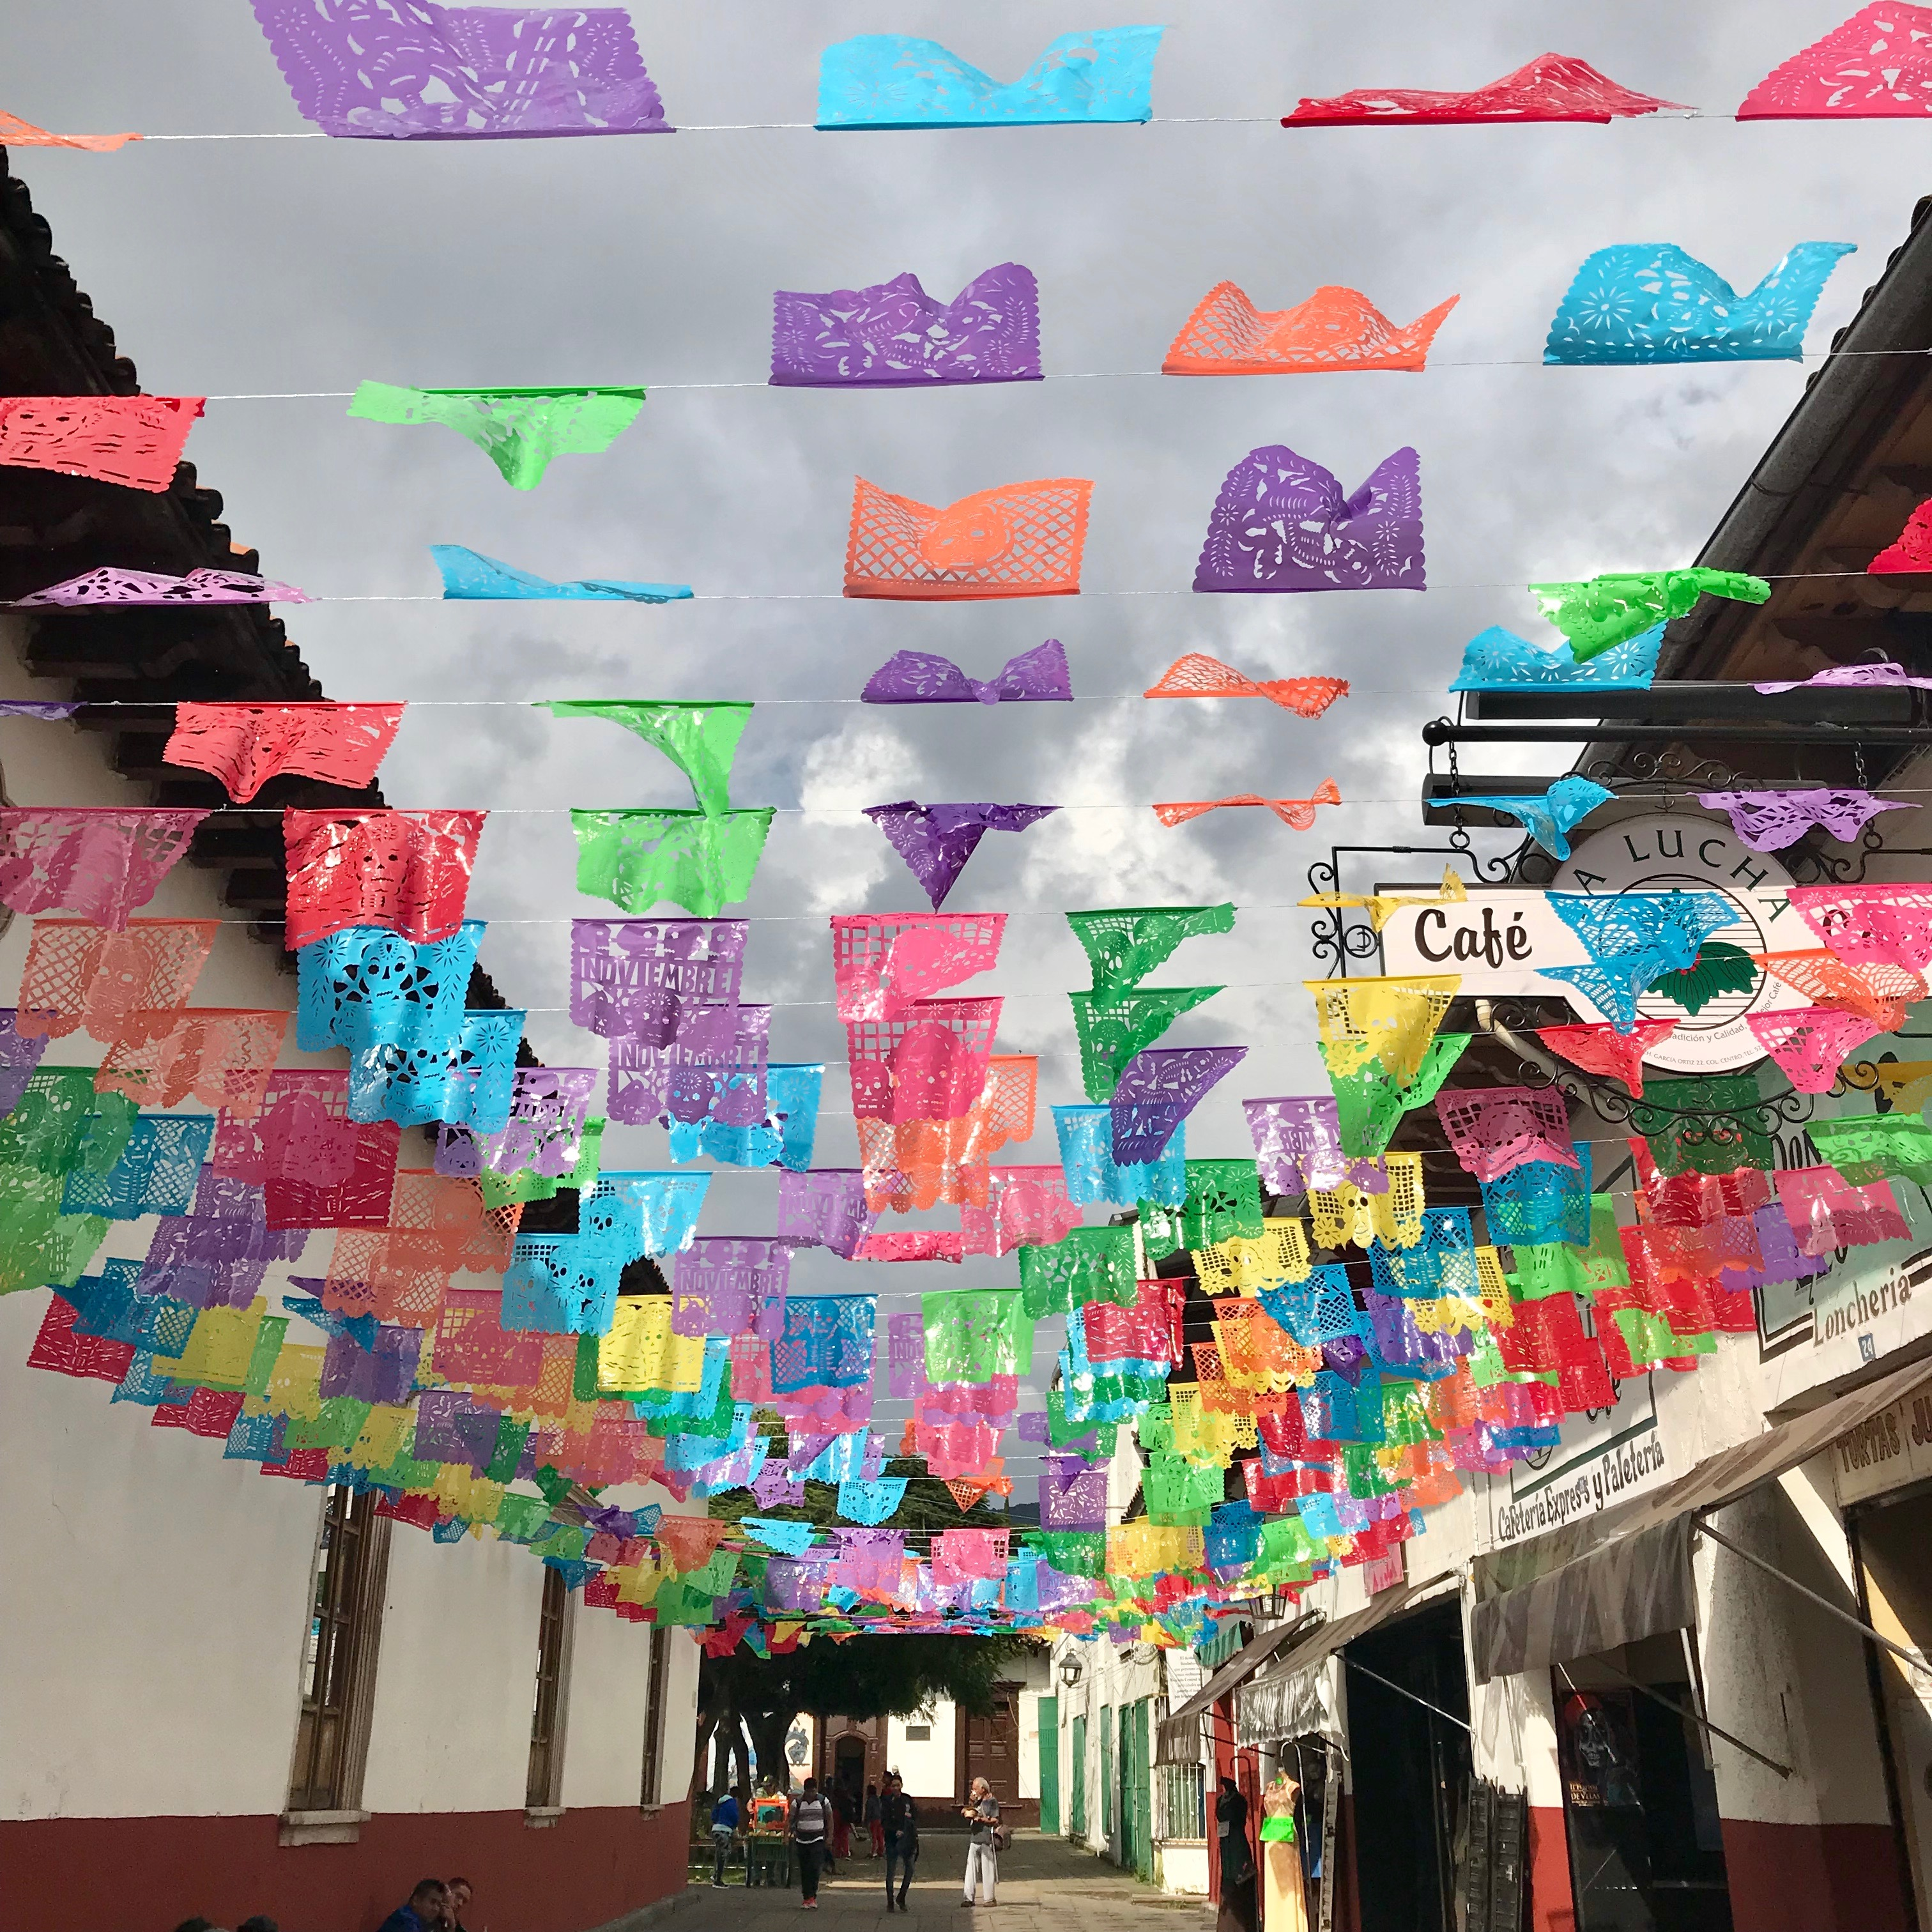 Uruapan, Mexico